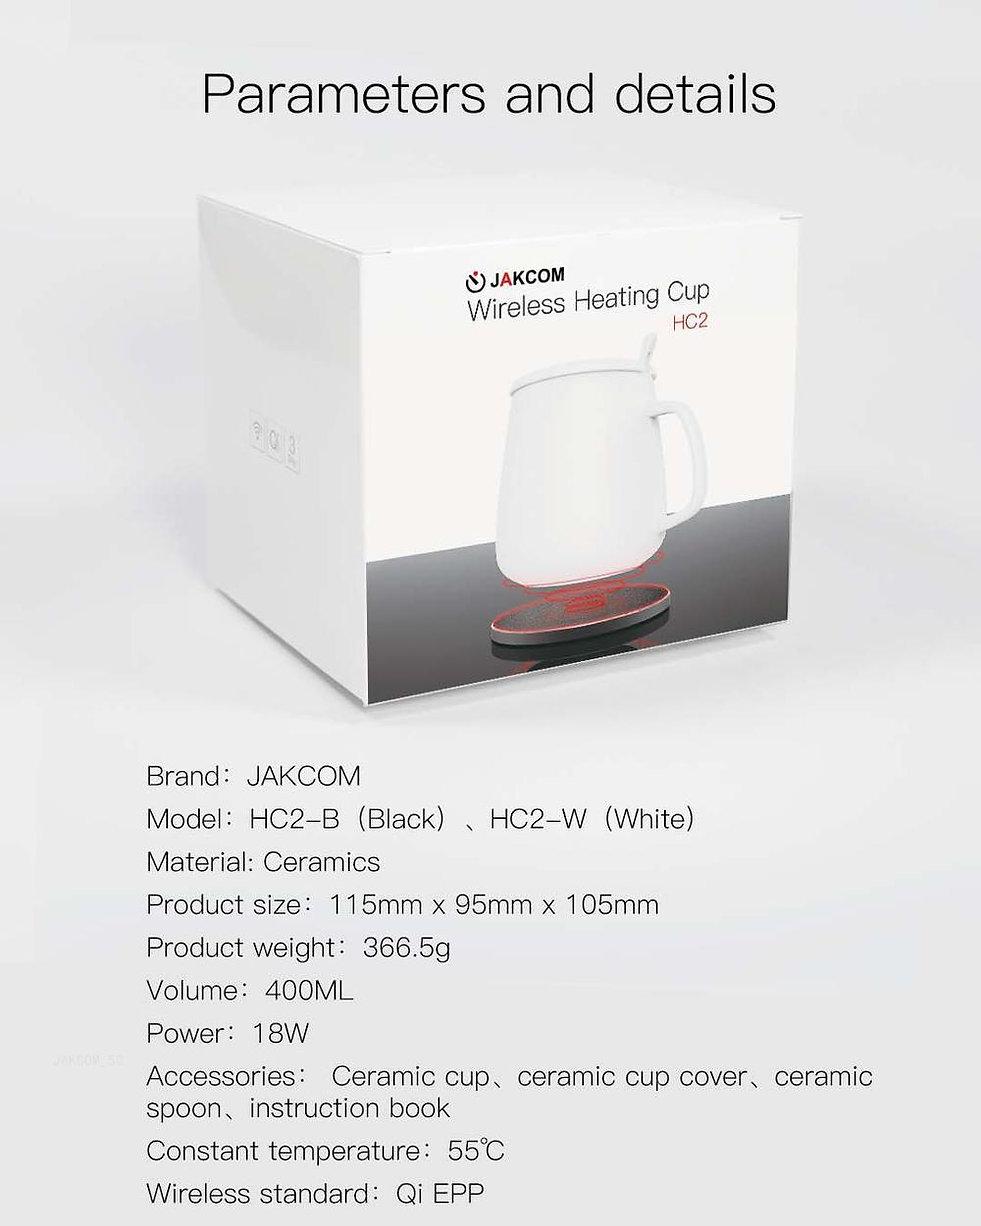 Wireless Heating Cup 12 Shoppiny.jpg